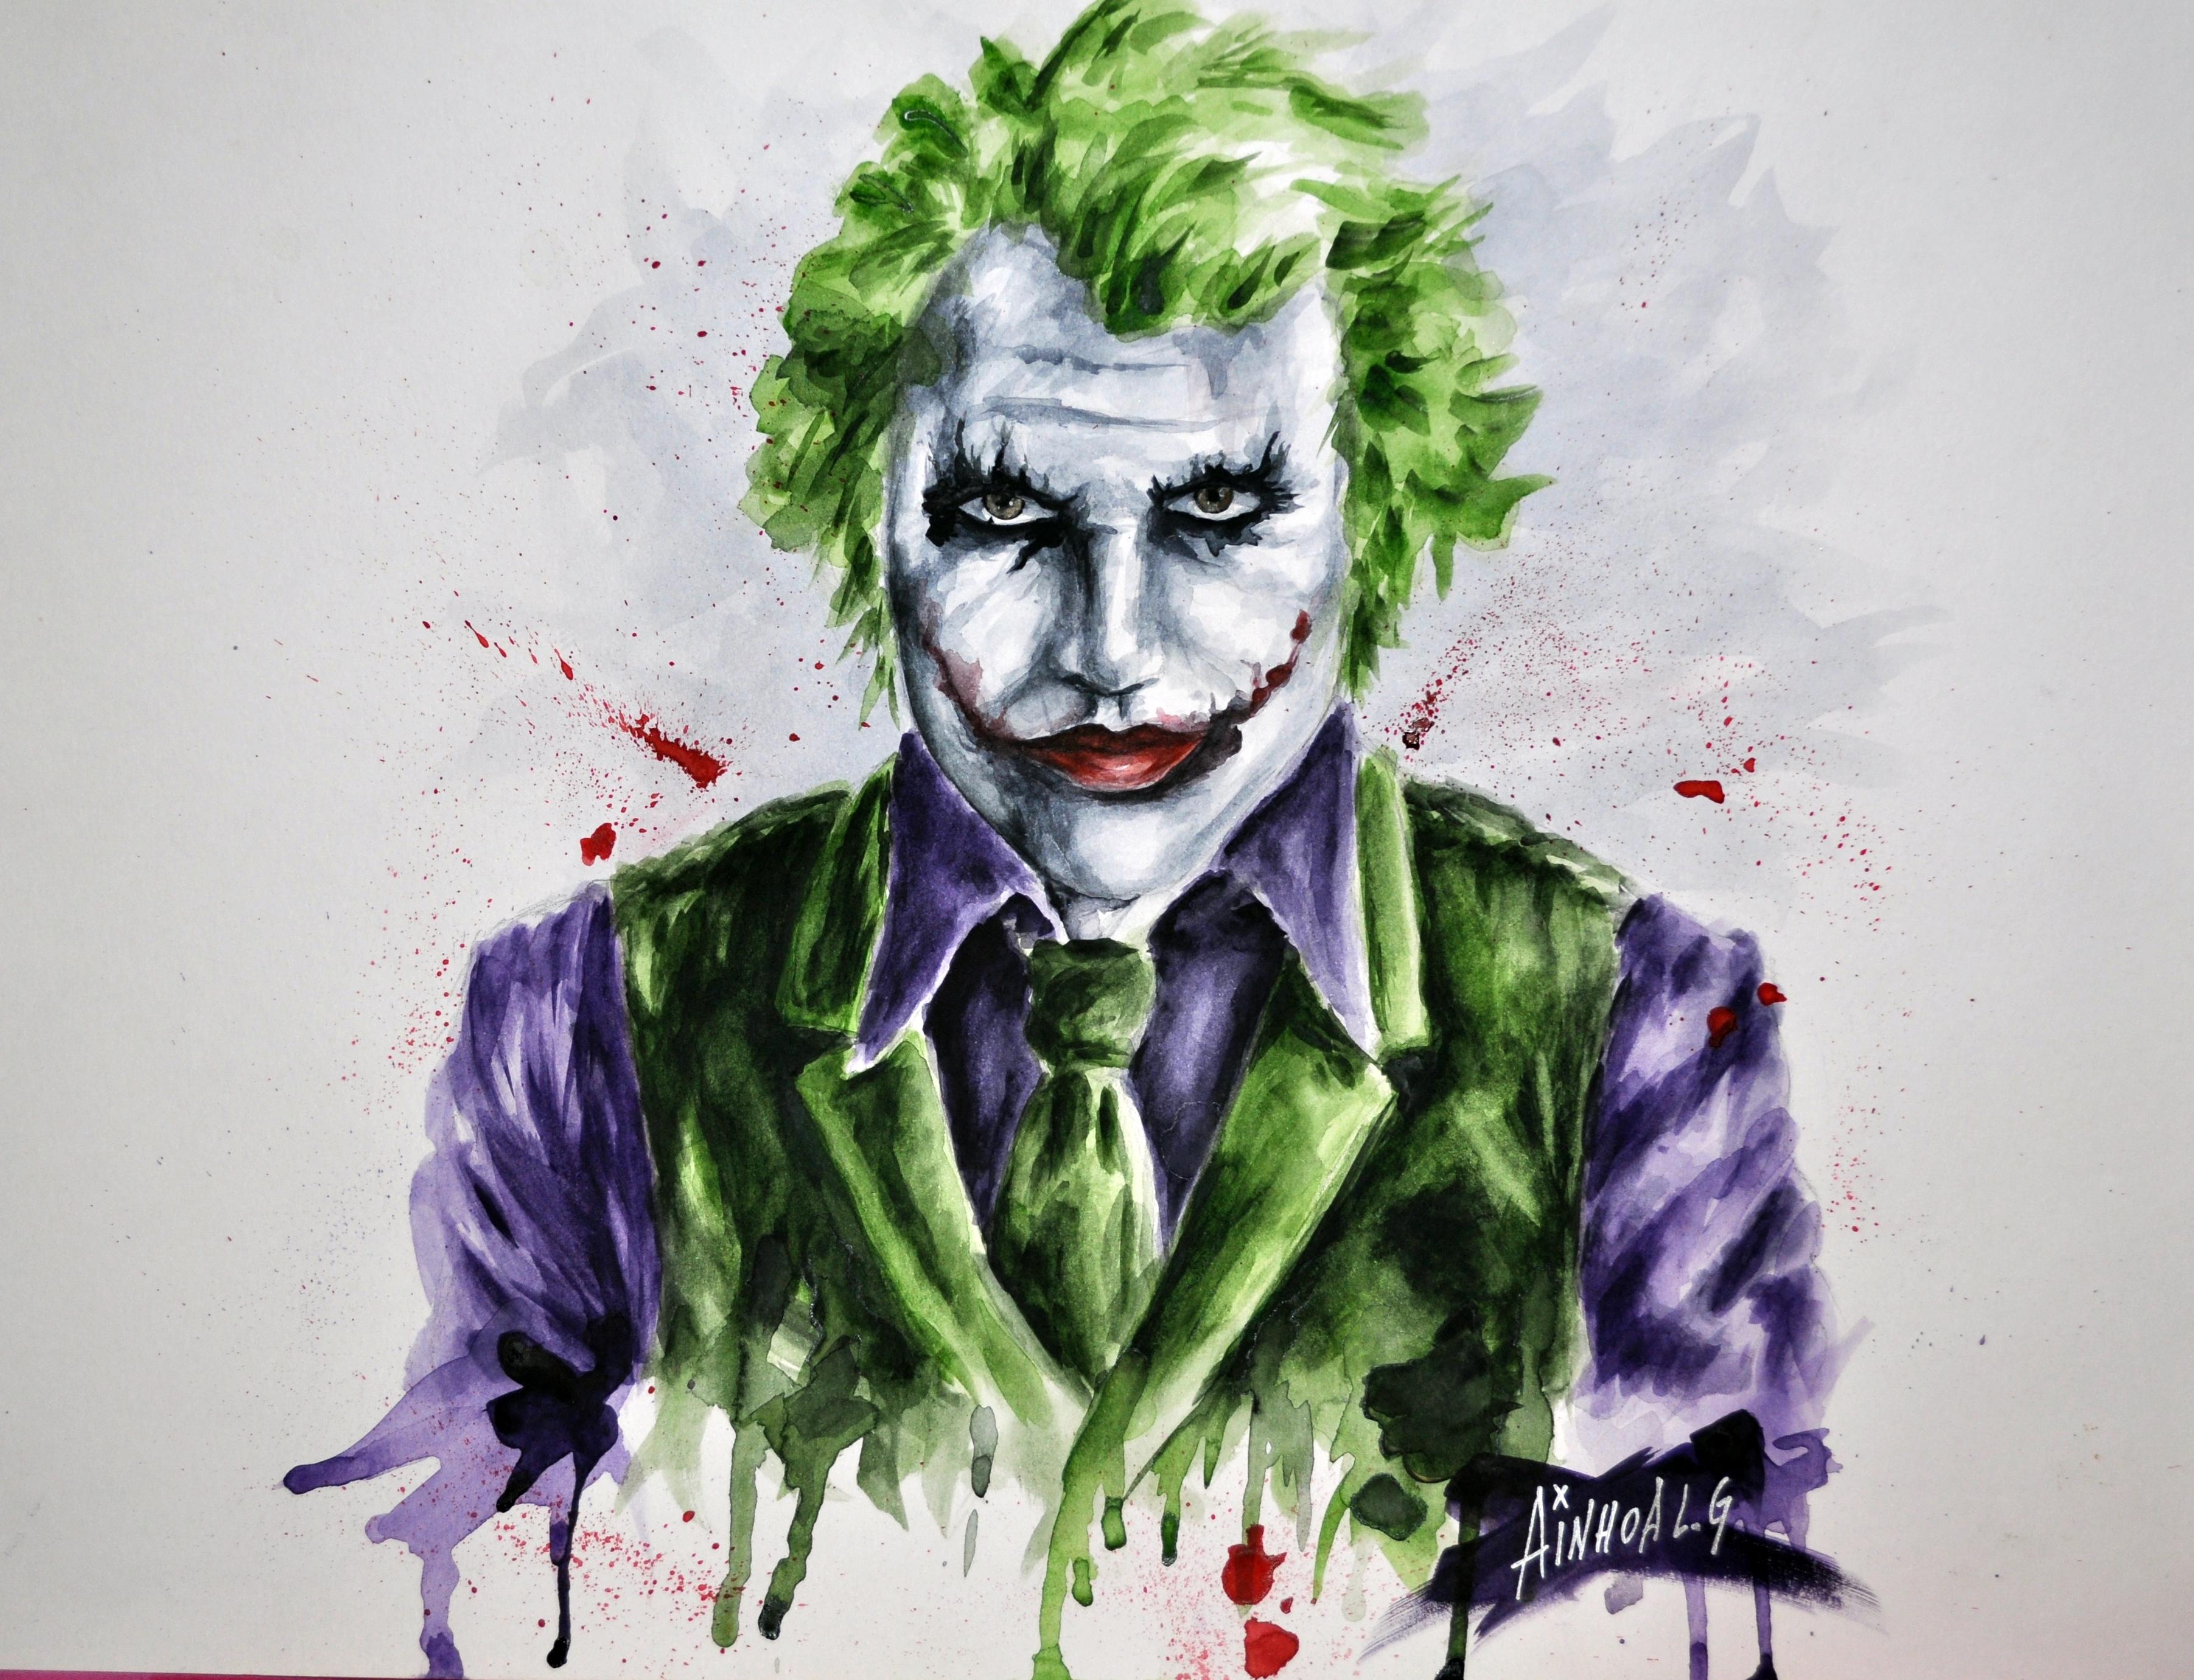 Joker - Heath Ledger by AinhoaLG